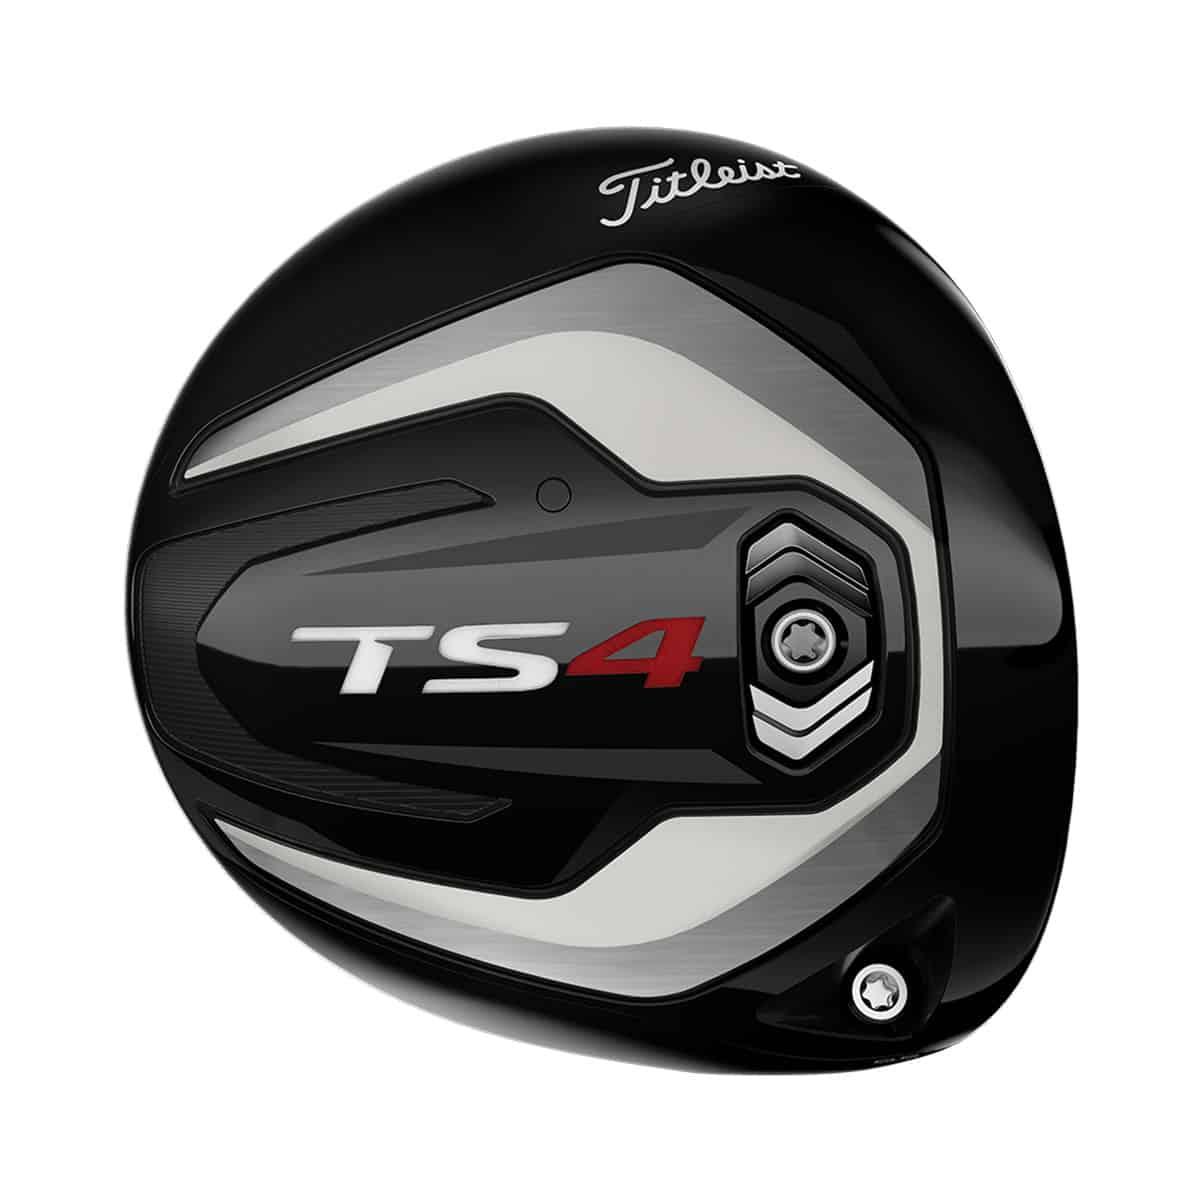 Titleist TS4 Driver 5